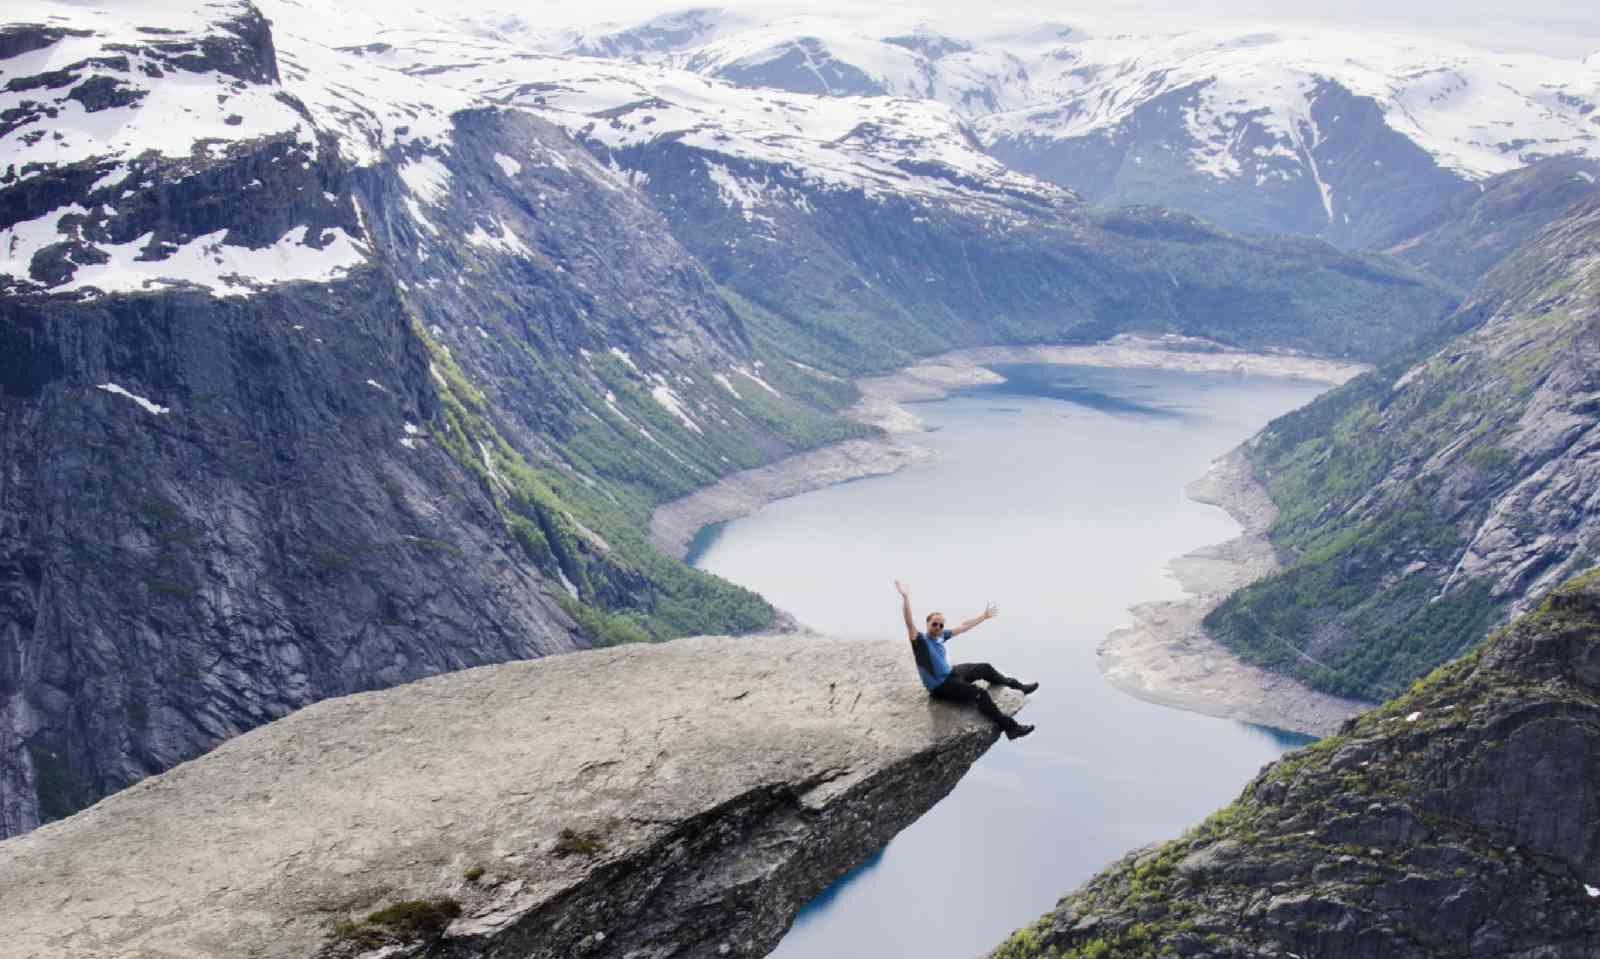 Dangling on the edge of Trolltunga (Neil S Price)